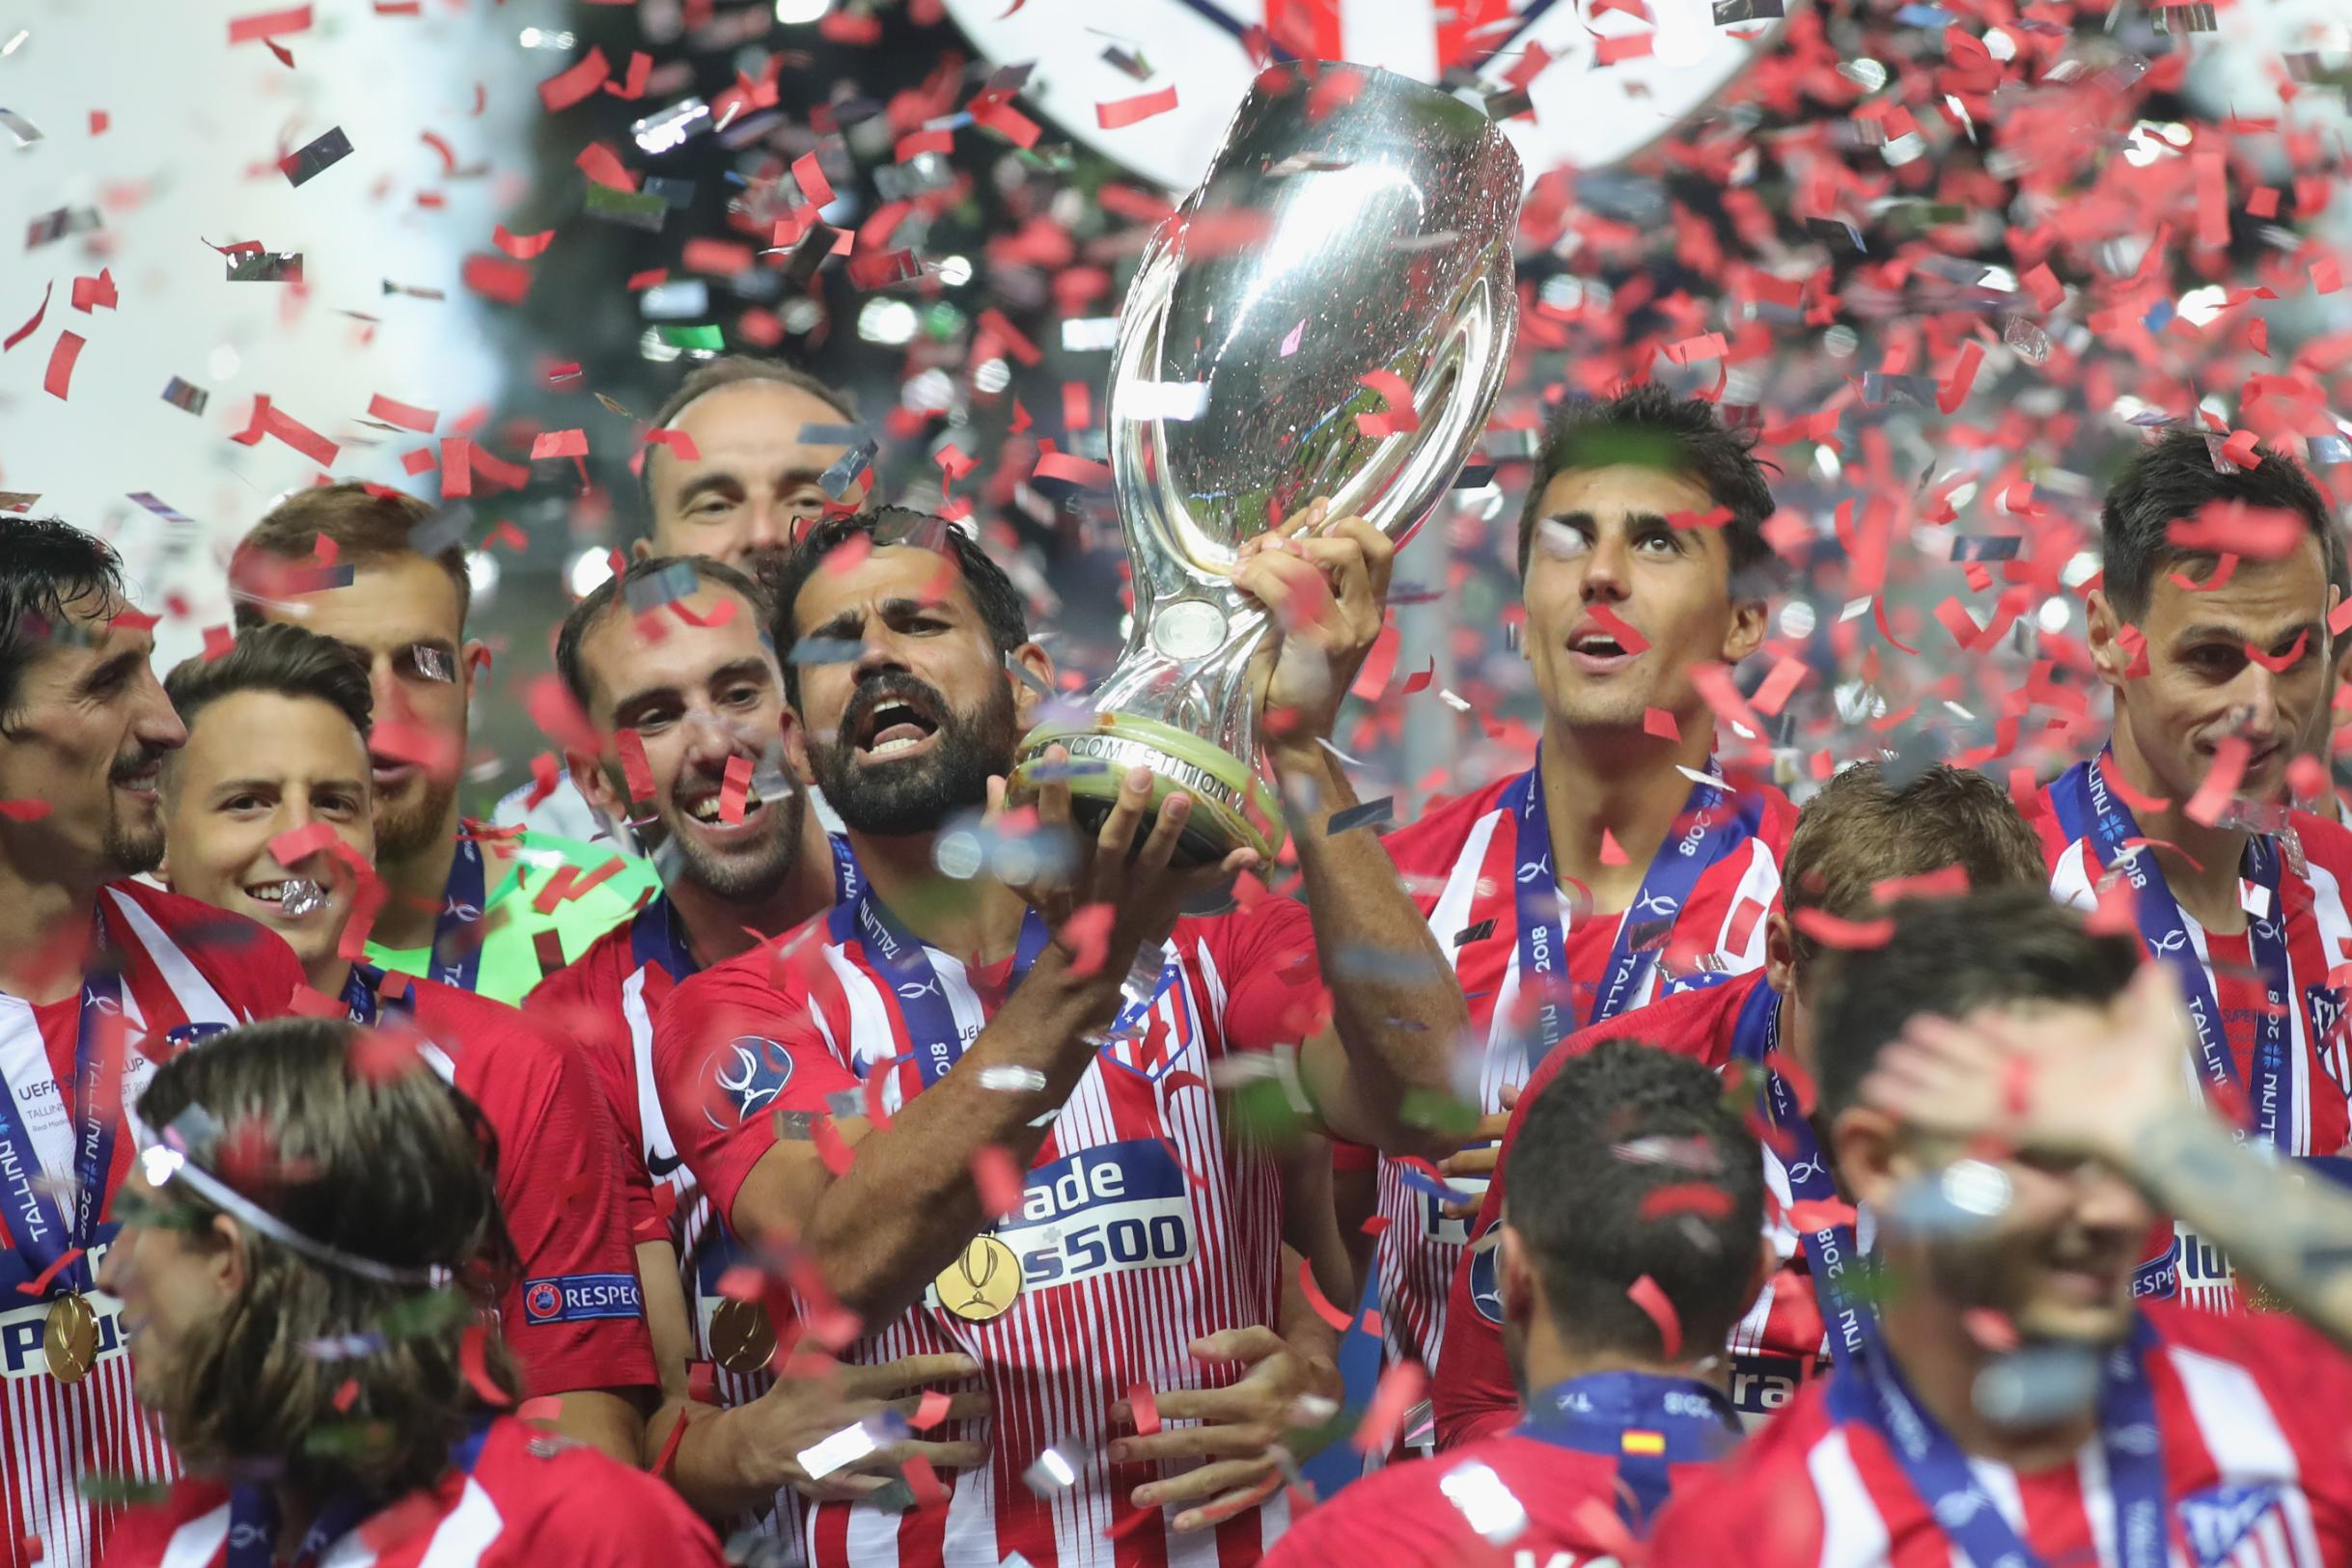 bdaa80bab Google News - Supercupa Europei - Cele mai recente